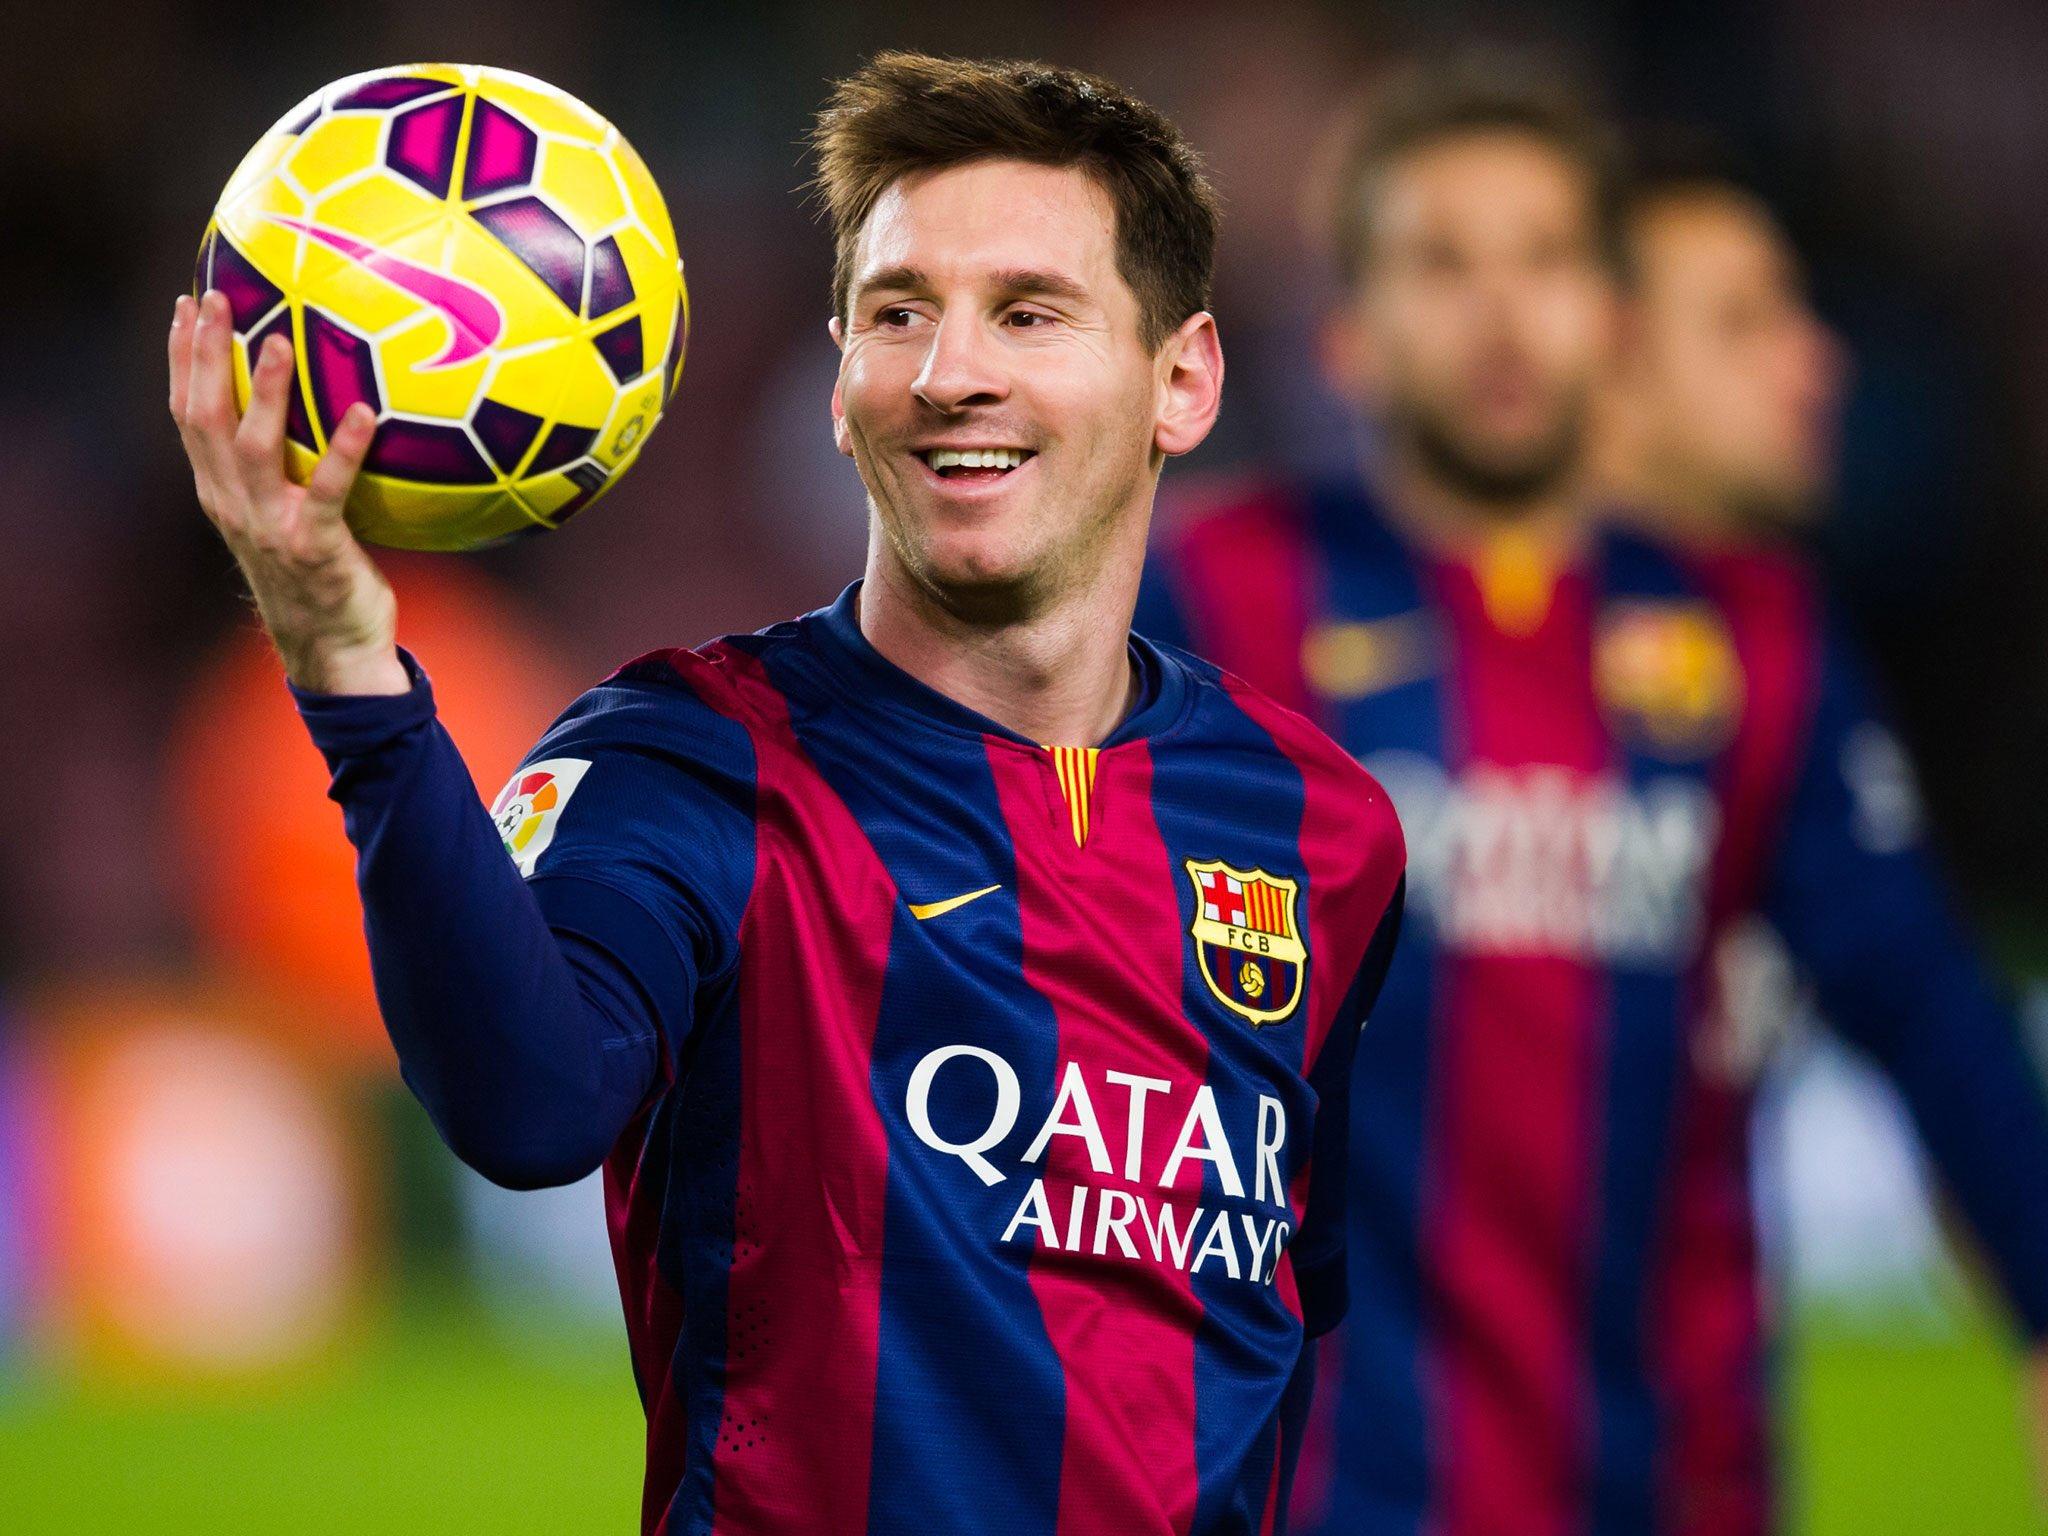 Elefant:Messi #llibredelesbèsties #c2cast16 https://t.co/bpVLHnL6P5